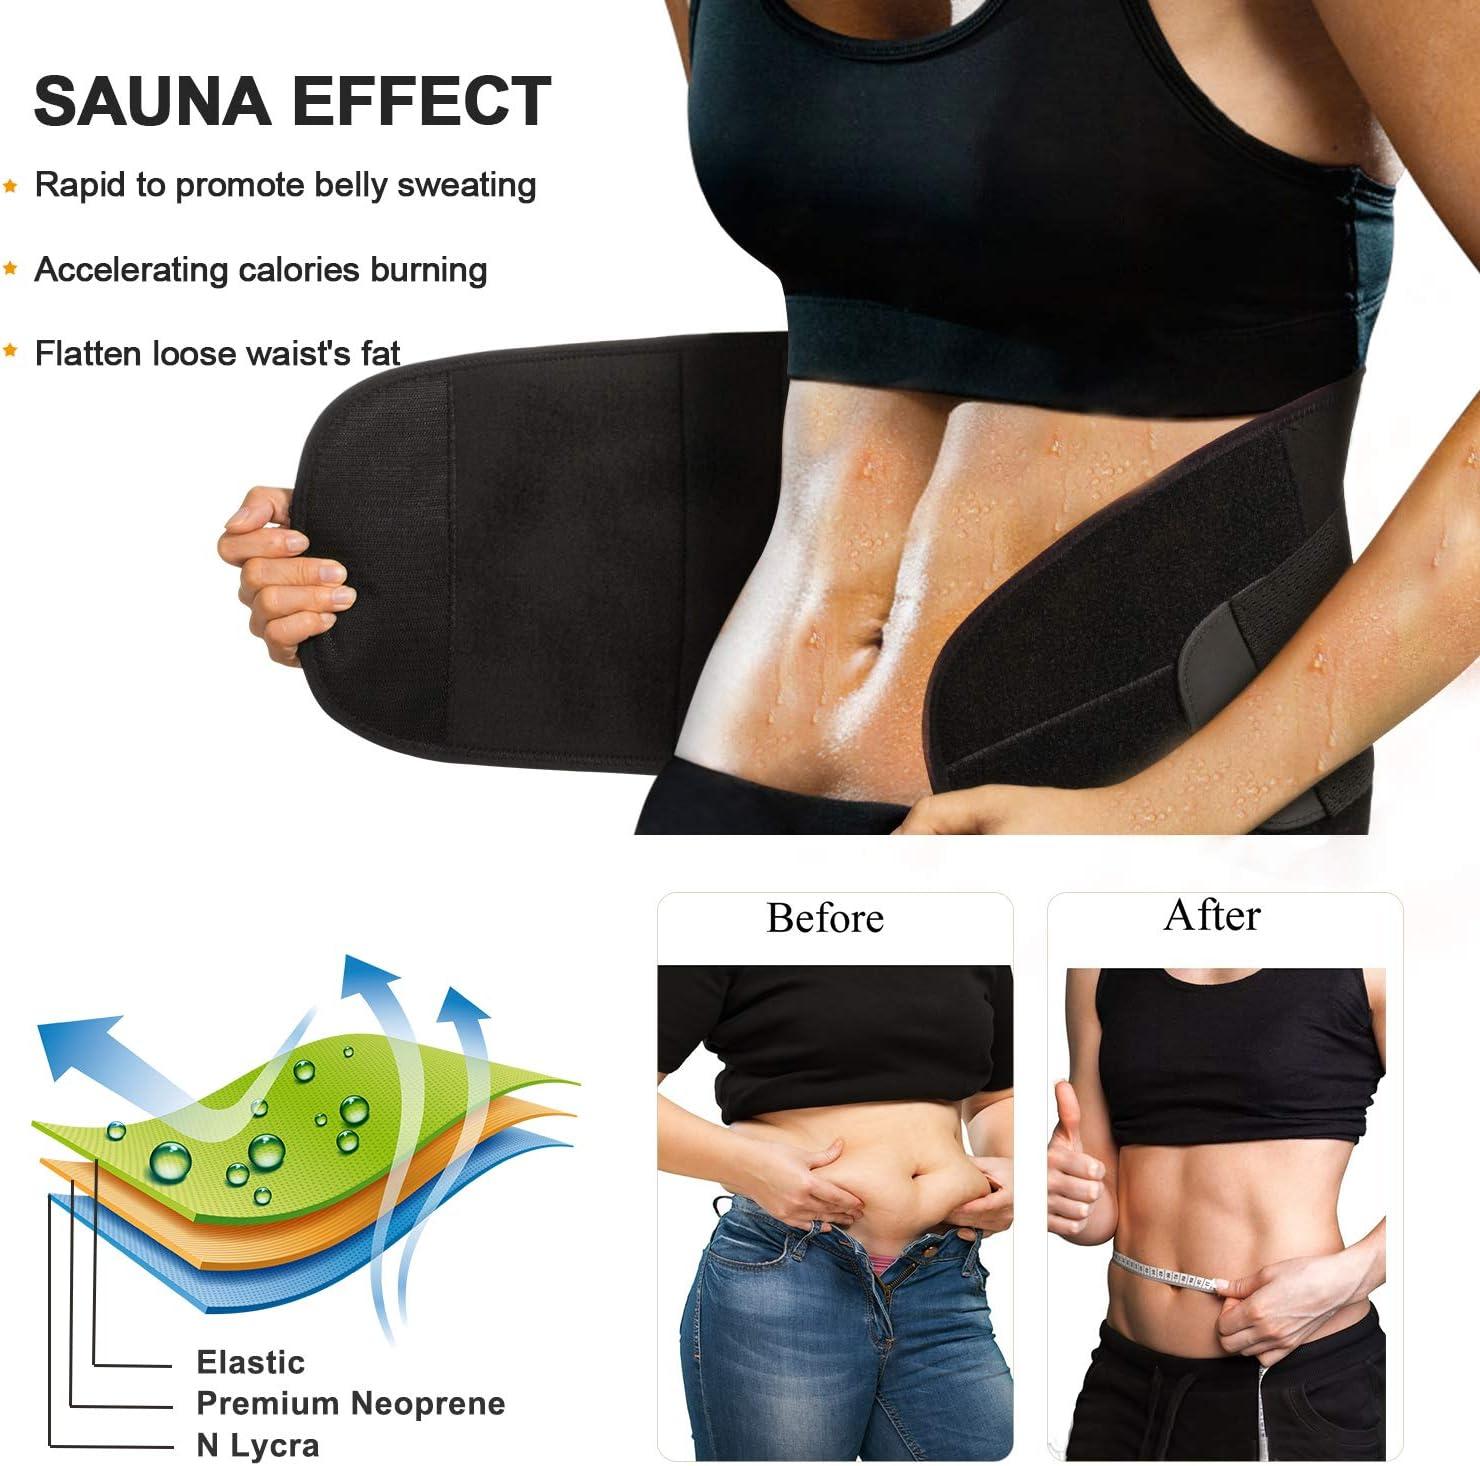 Black, M Hot Neoprene Sauna Sweat Belly Band Body Shaper for Weight Loss Back Support Hourglass Waist Trainer Trimmer Slimming Belt Waistline 29.5-32.3